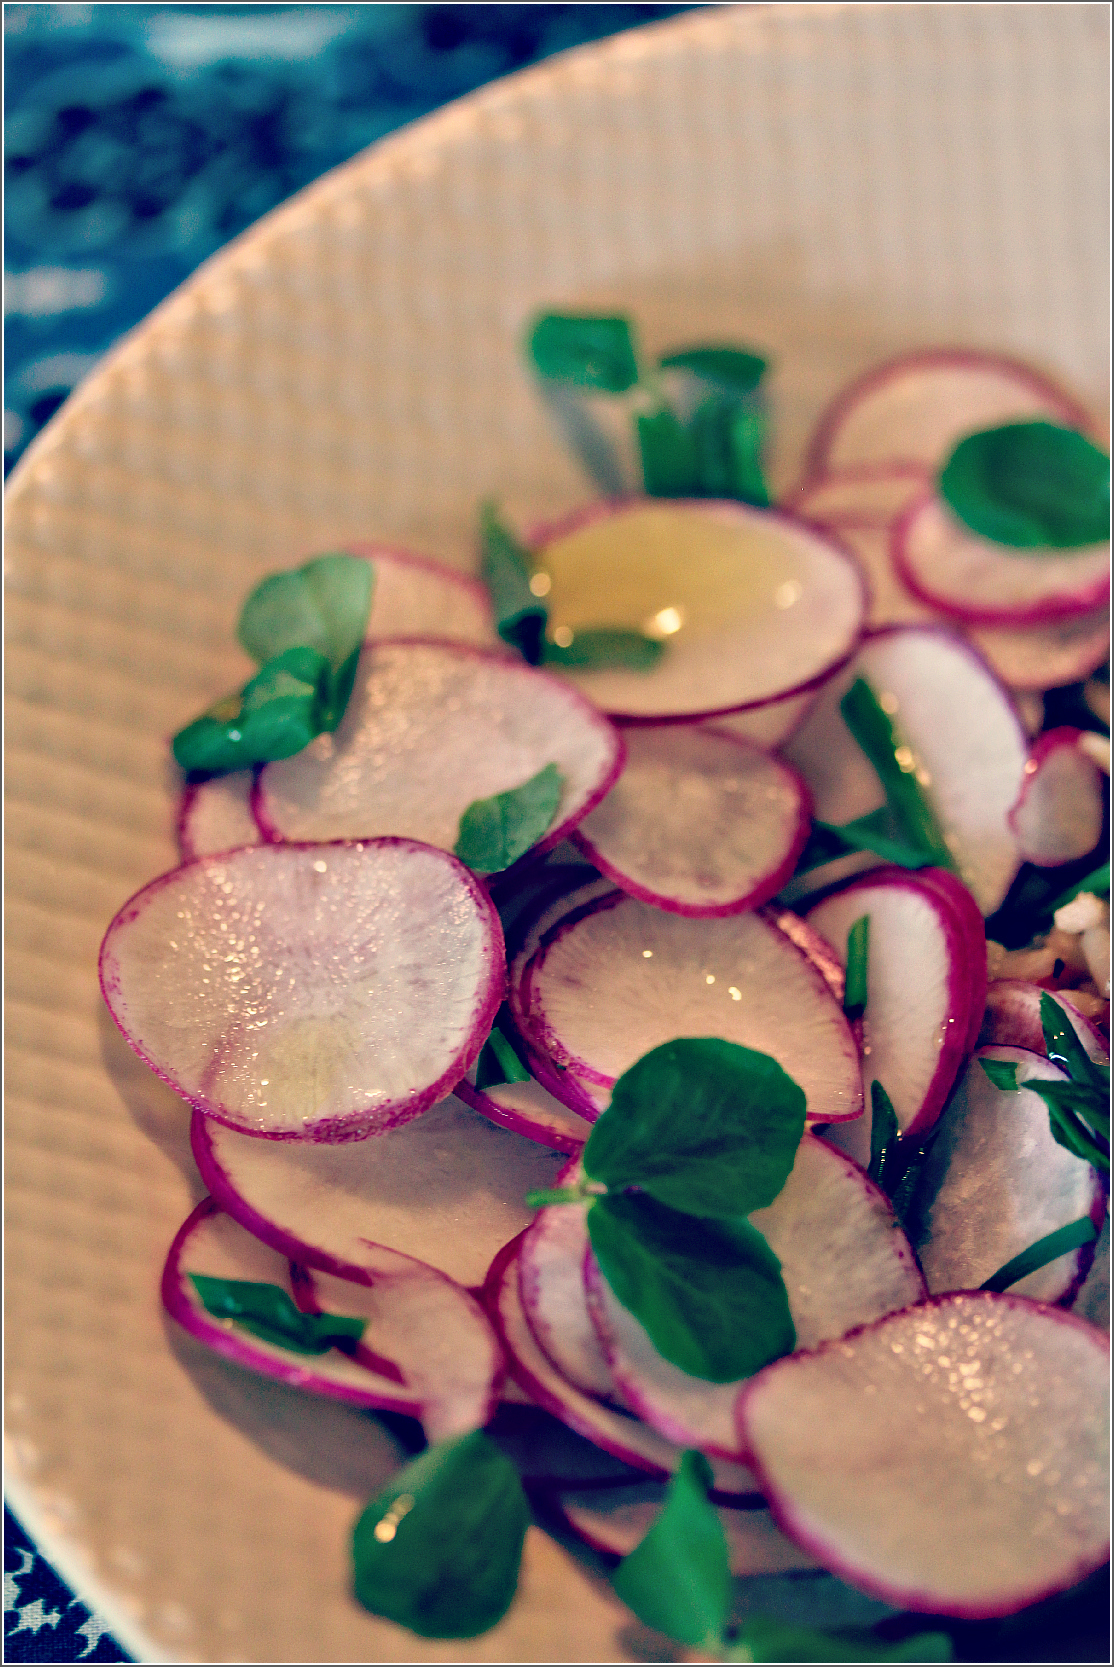 Radish Salad Upclose by Dena T Bray©.jpg